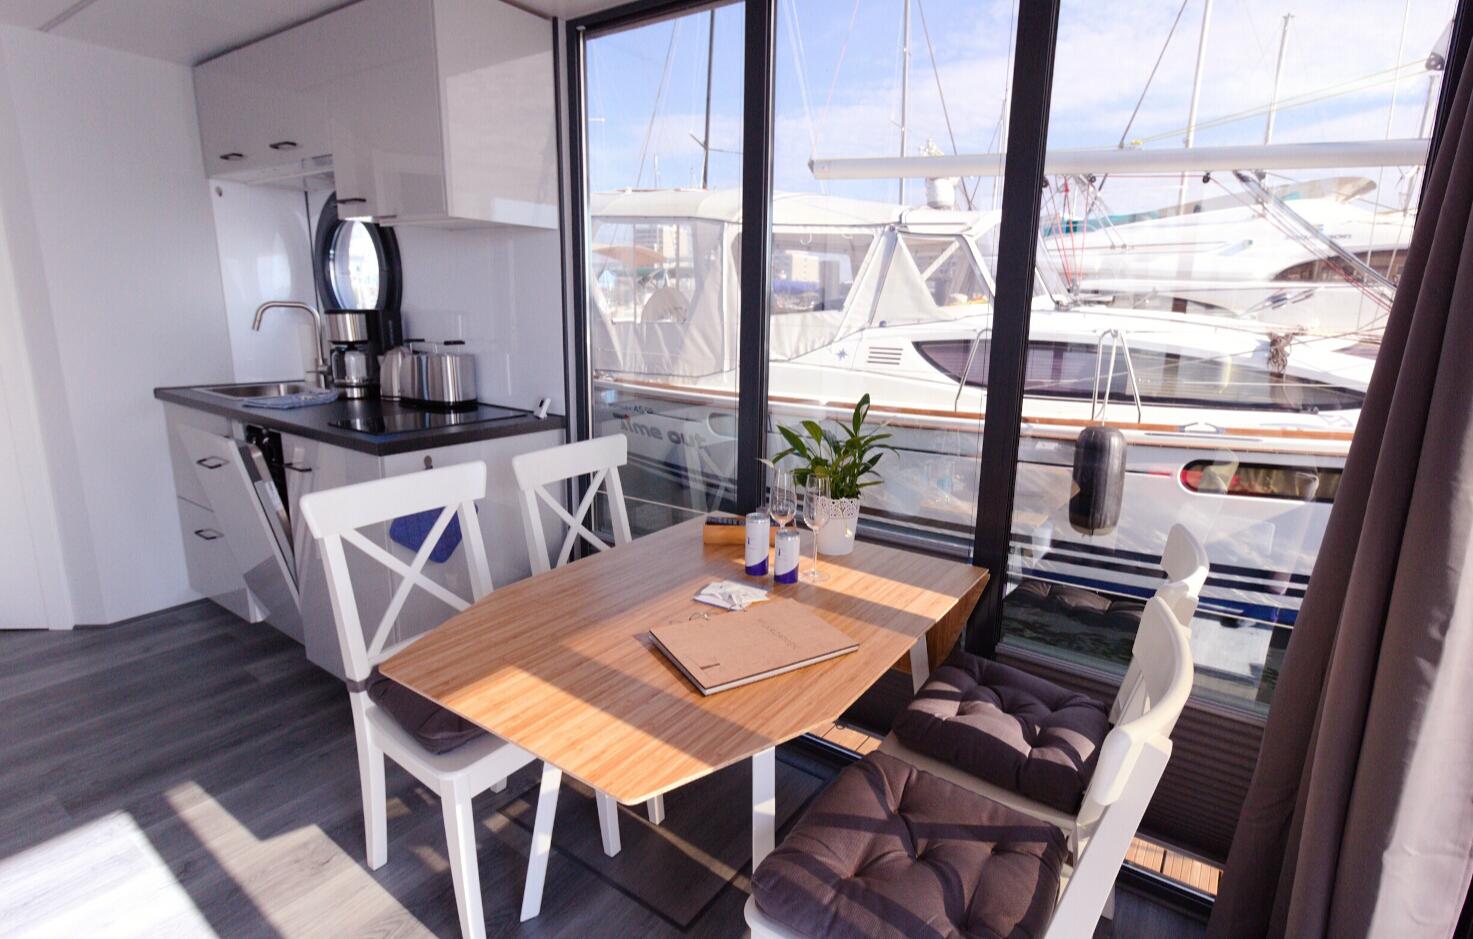 hausboot-kurzulaub-ohne-sauna-5-tage-4-uen-4-personen-bg3